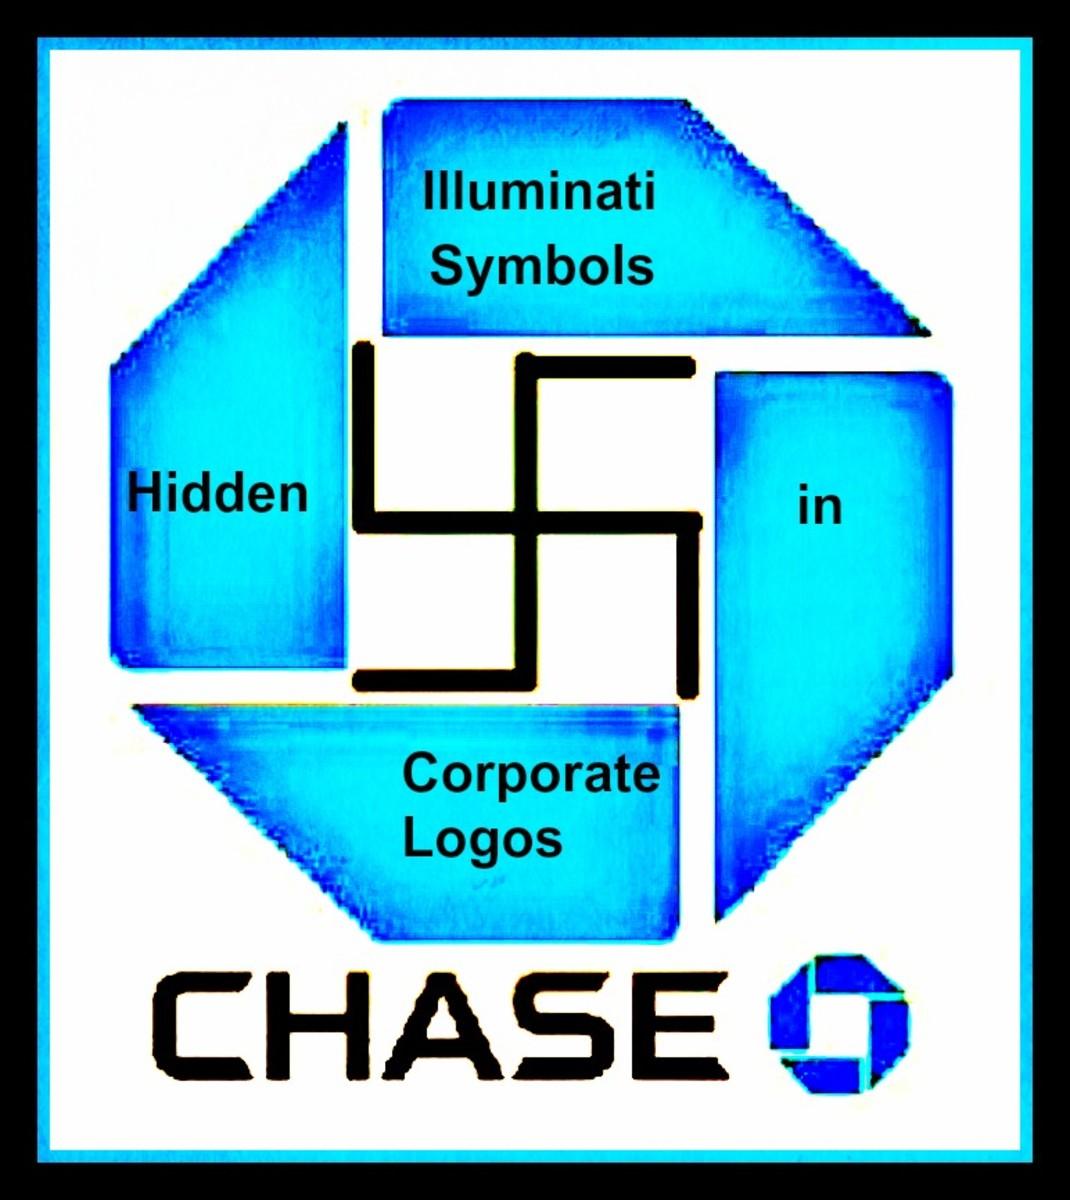 Illuminati Symbols Hidden in Corporate Logos